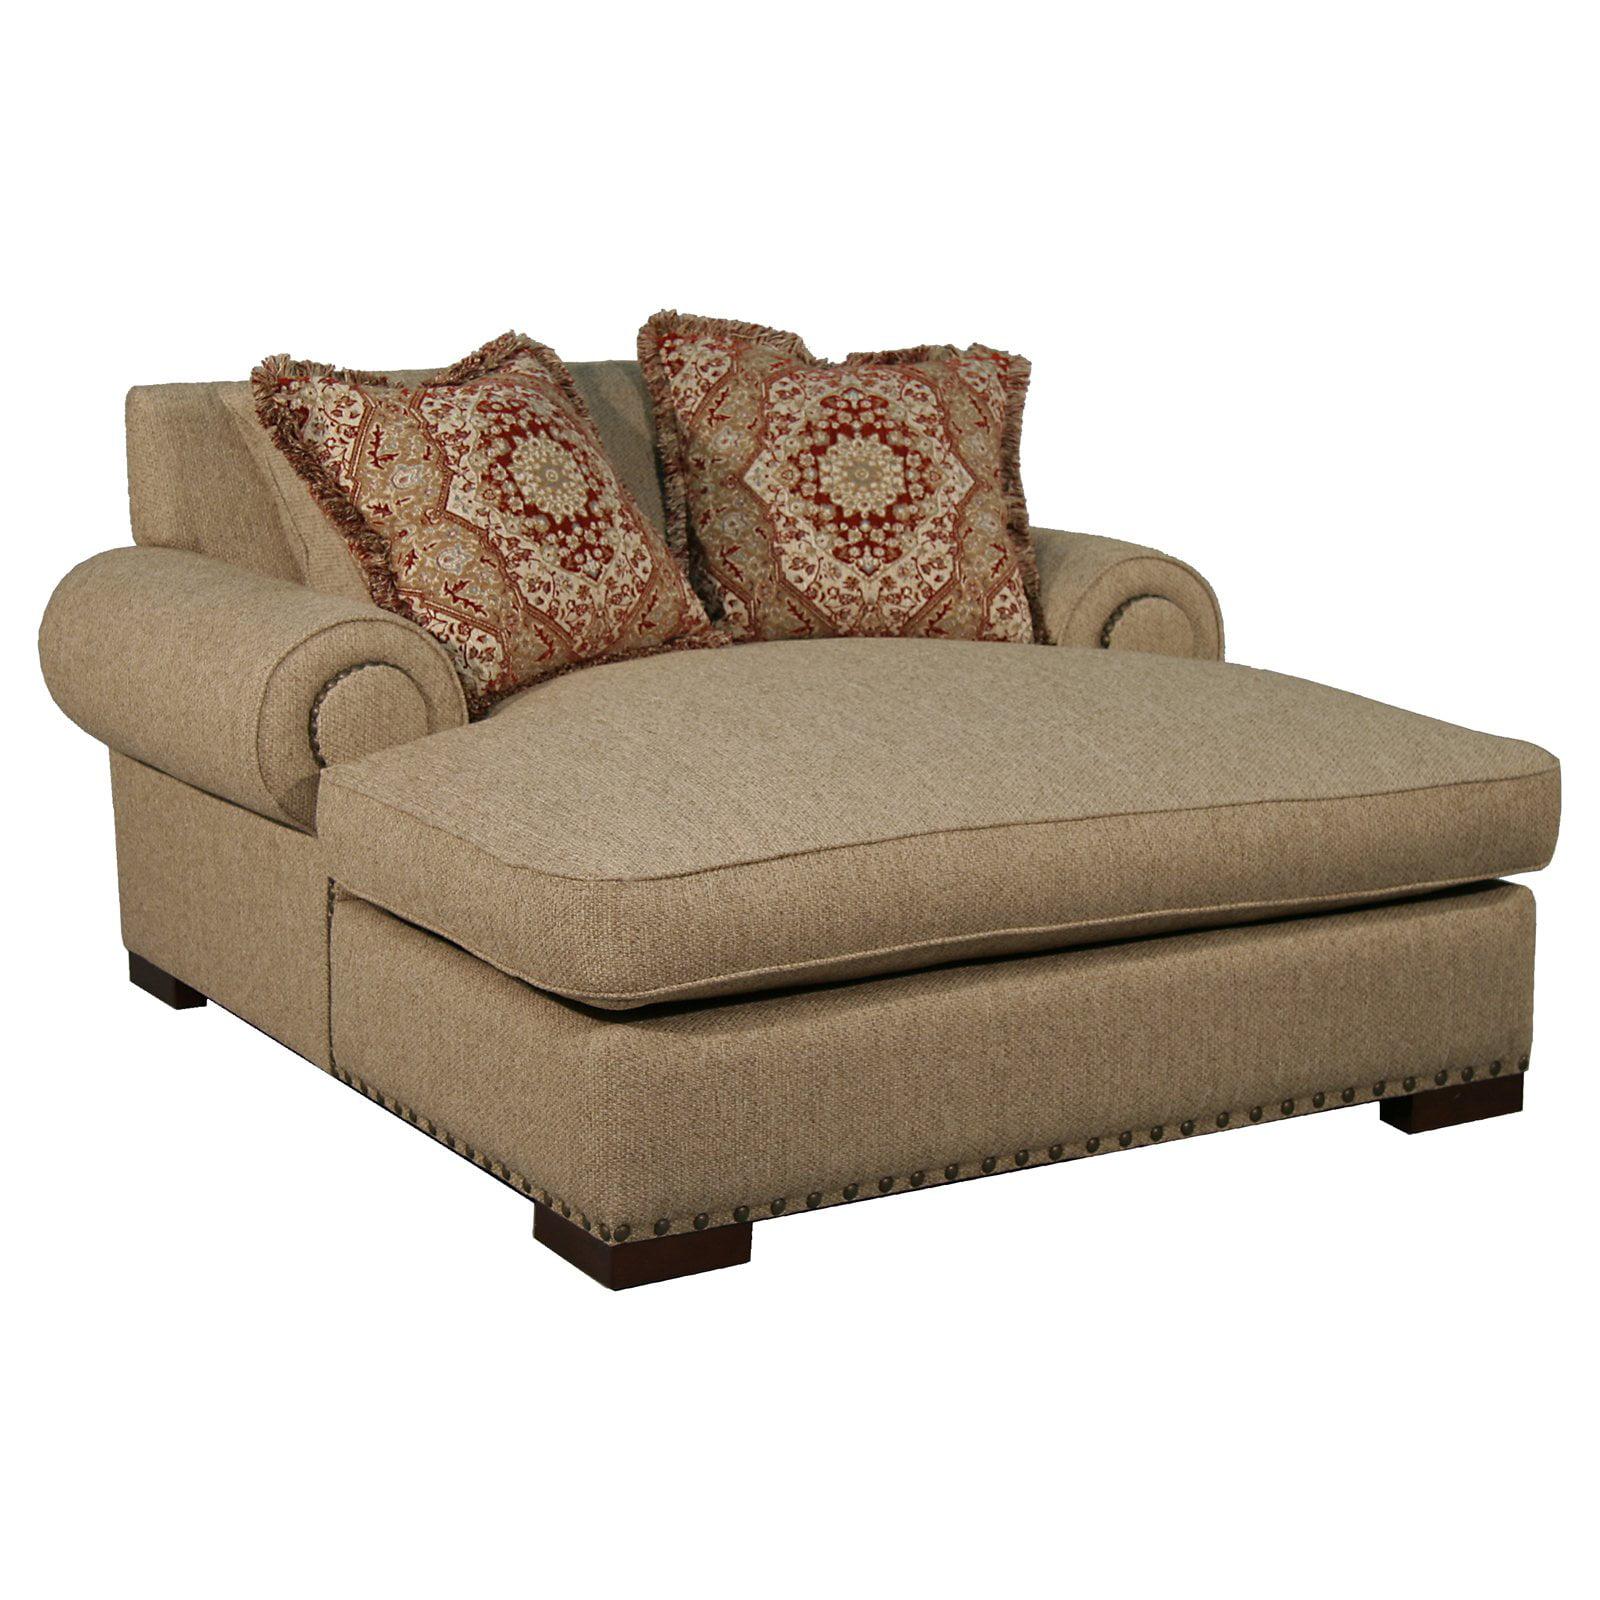 Fairmont Designs Murrieta Chaise Lounge - Walmart.com - Walmart.com